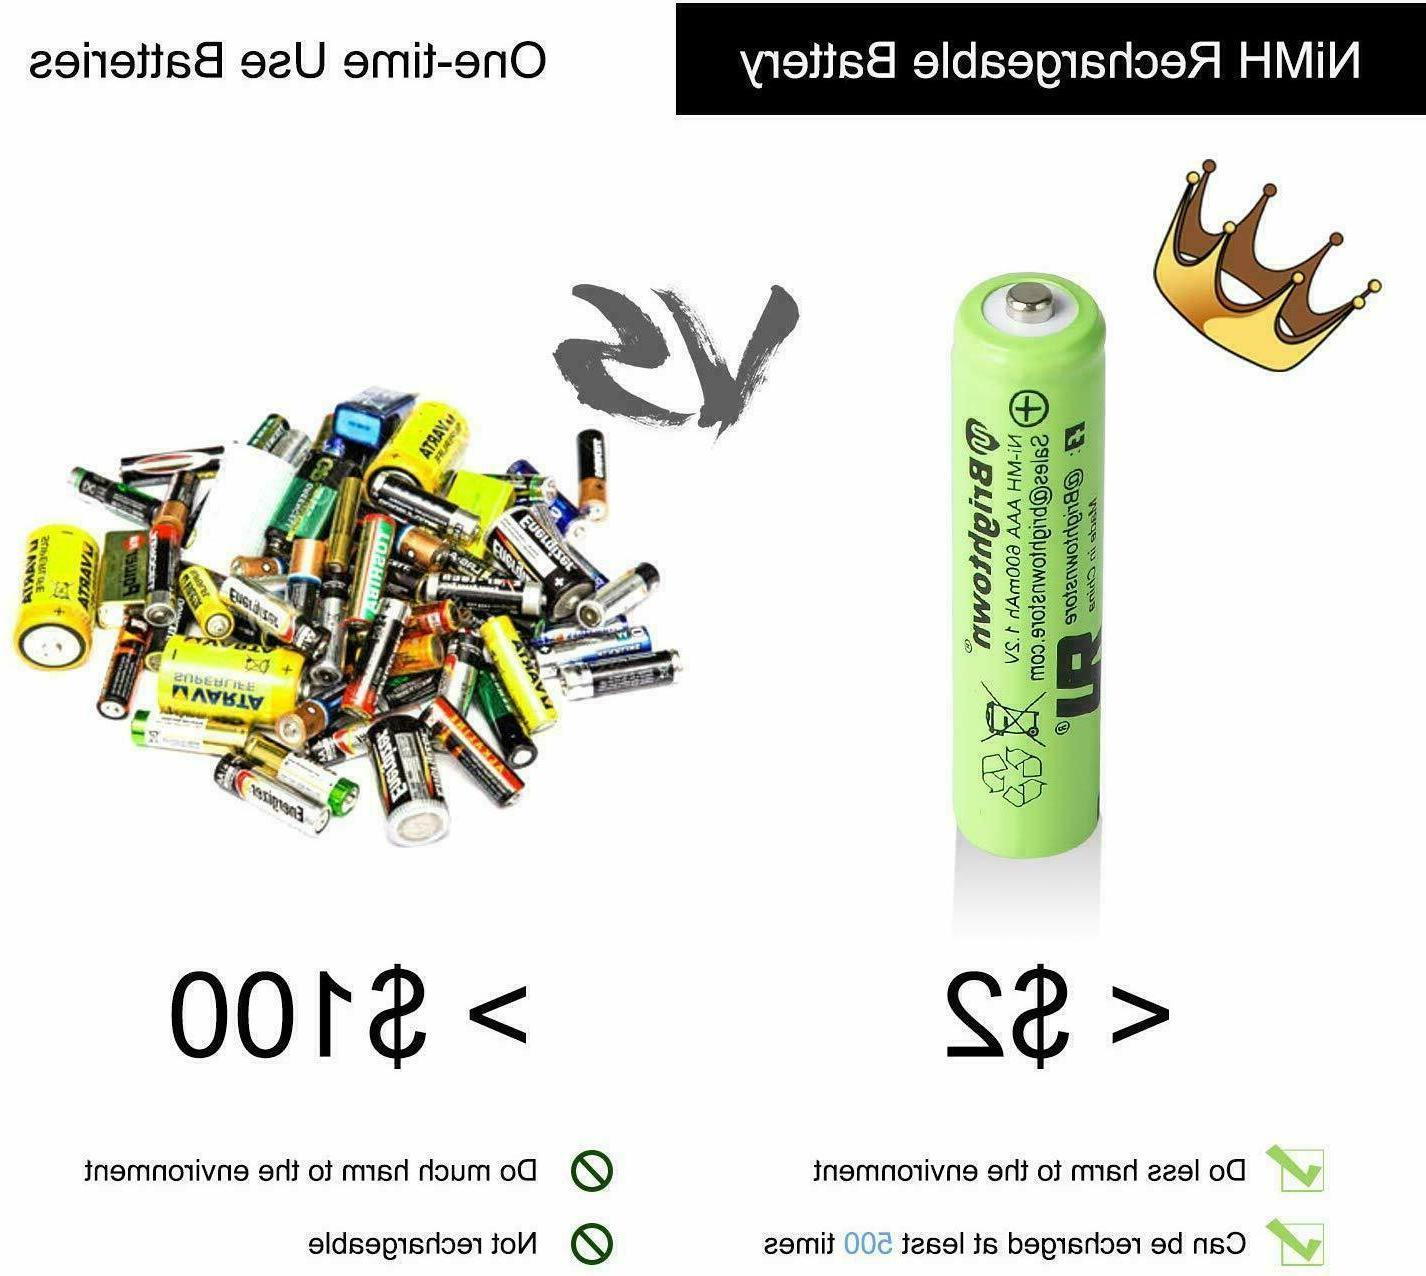 4-16 Rechargeable Batteries Ni-Mh 800mAh Charger Ni-Mh